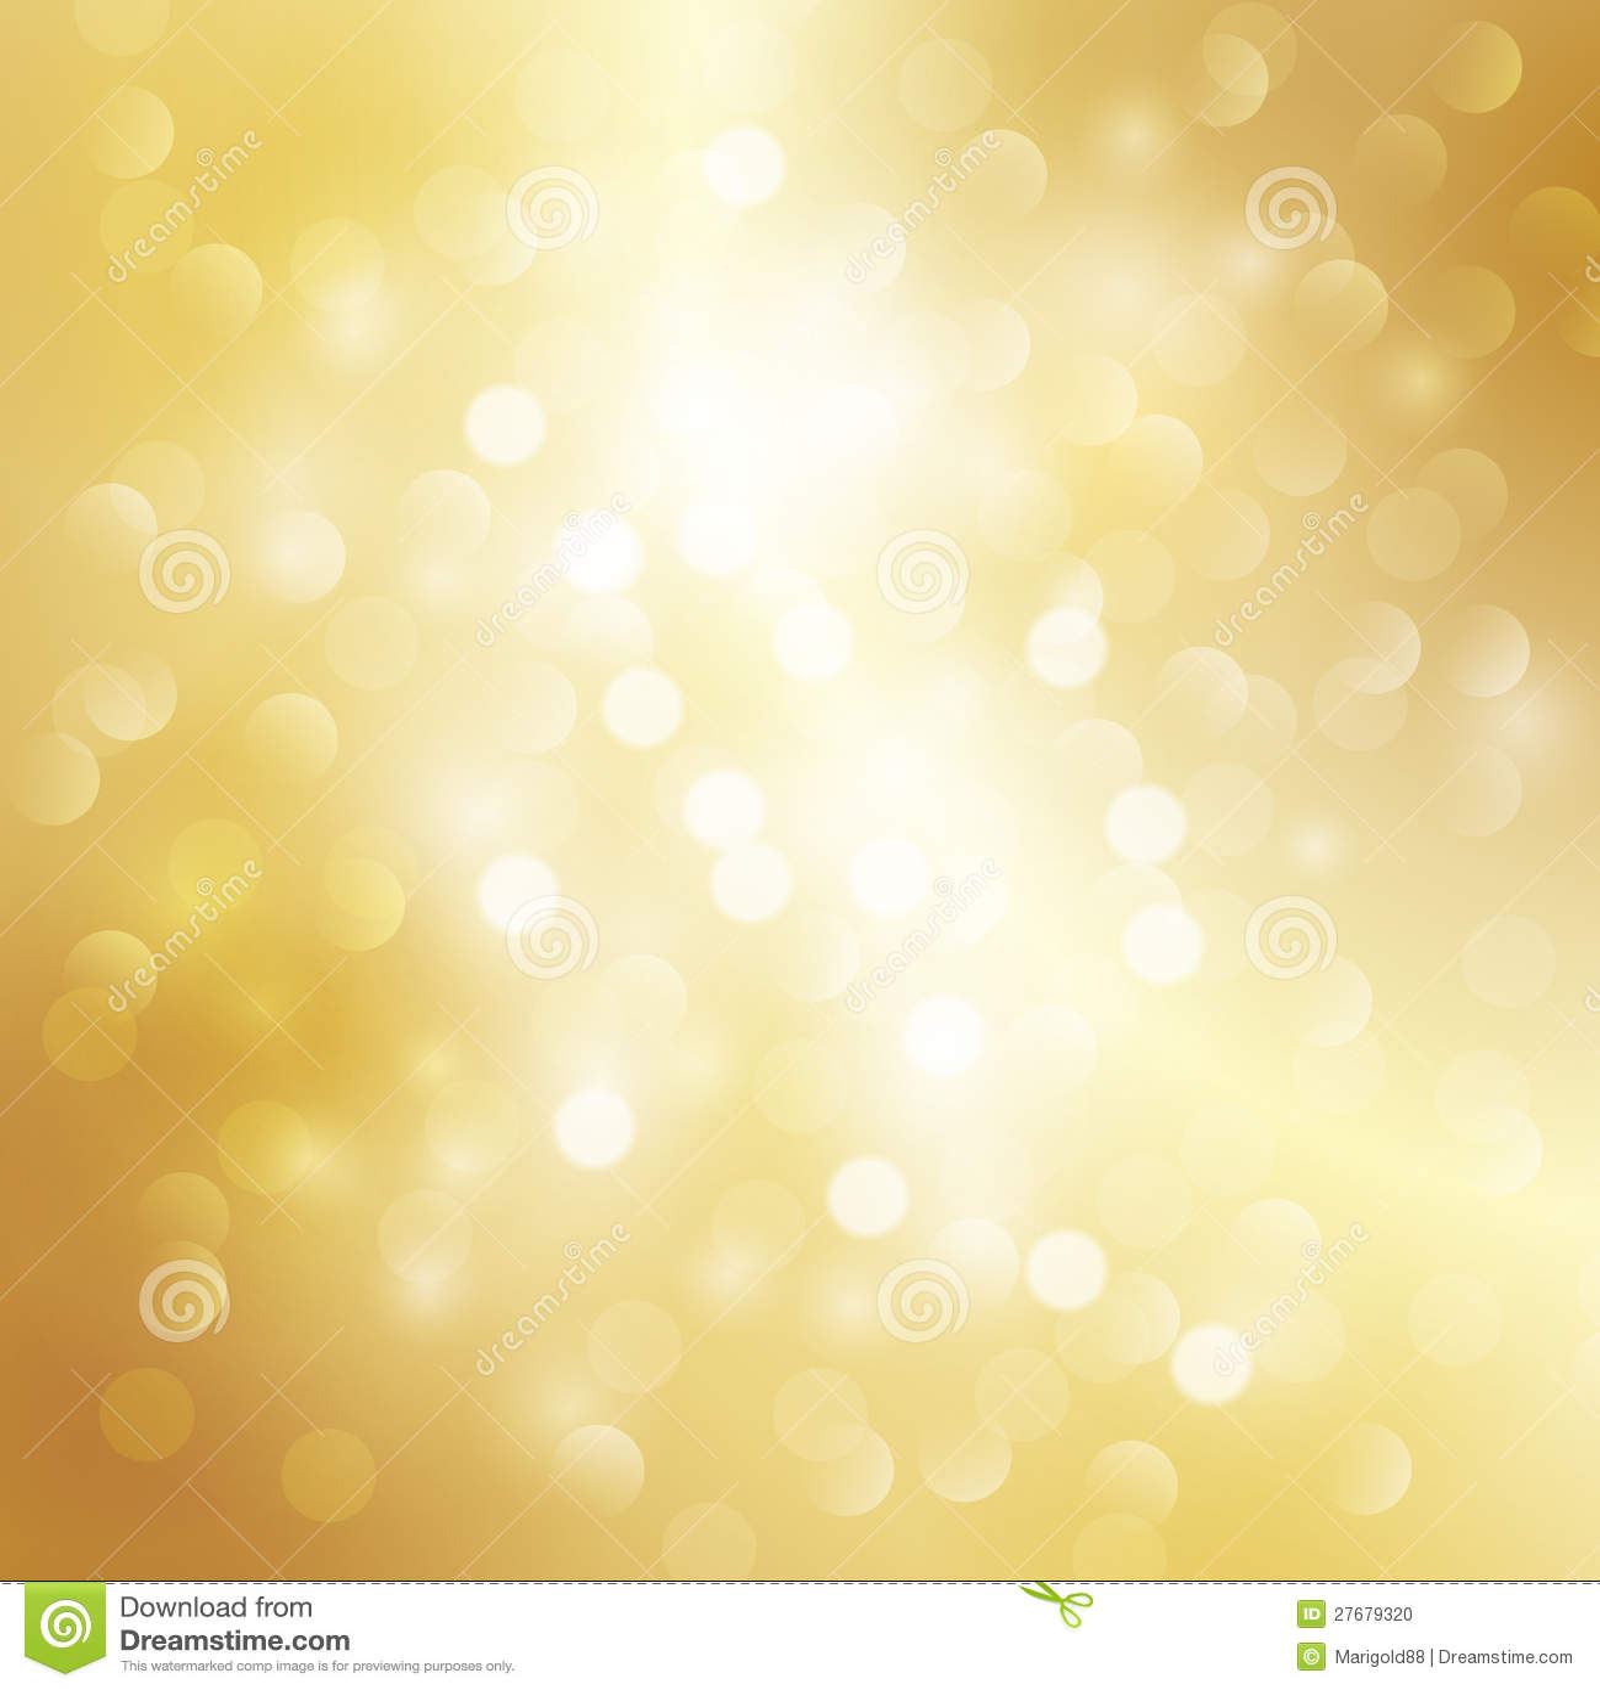 light golden background - photo #22